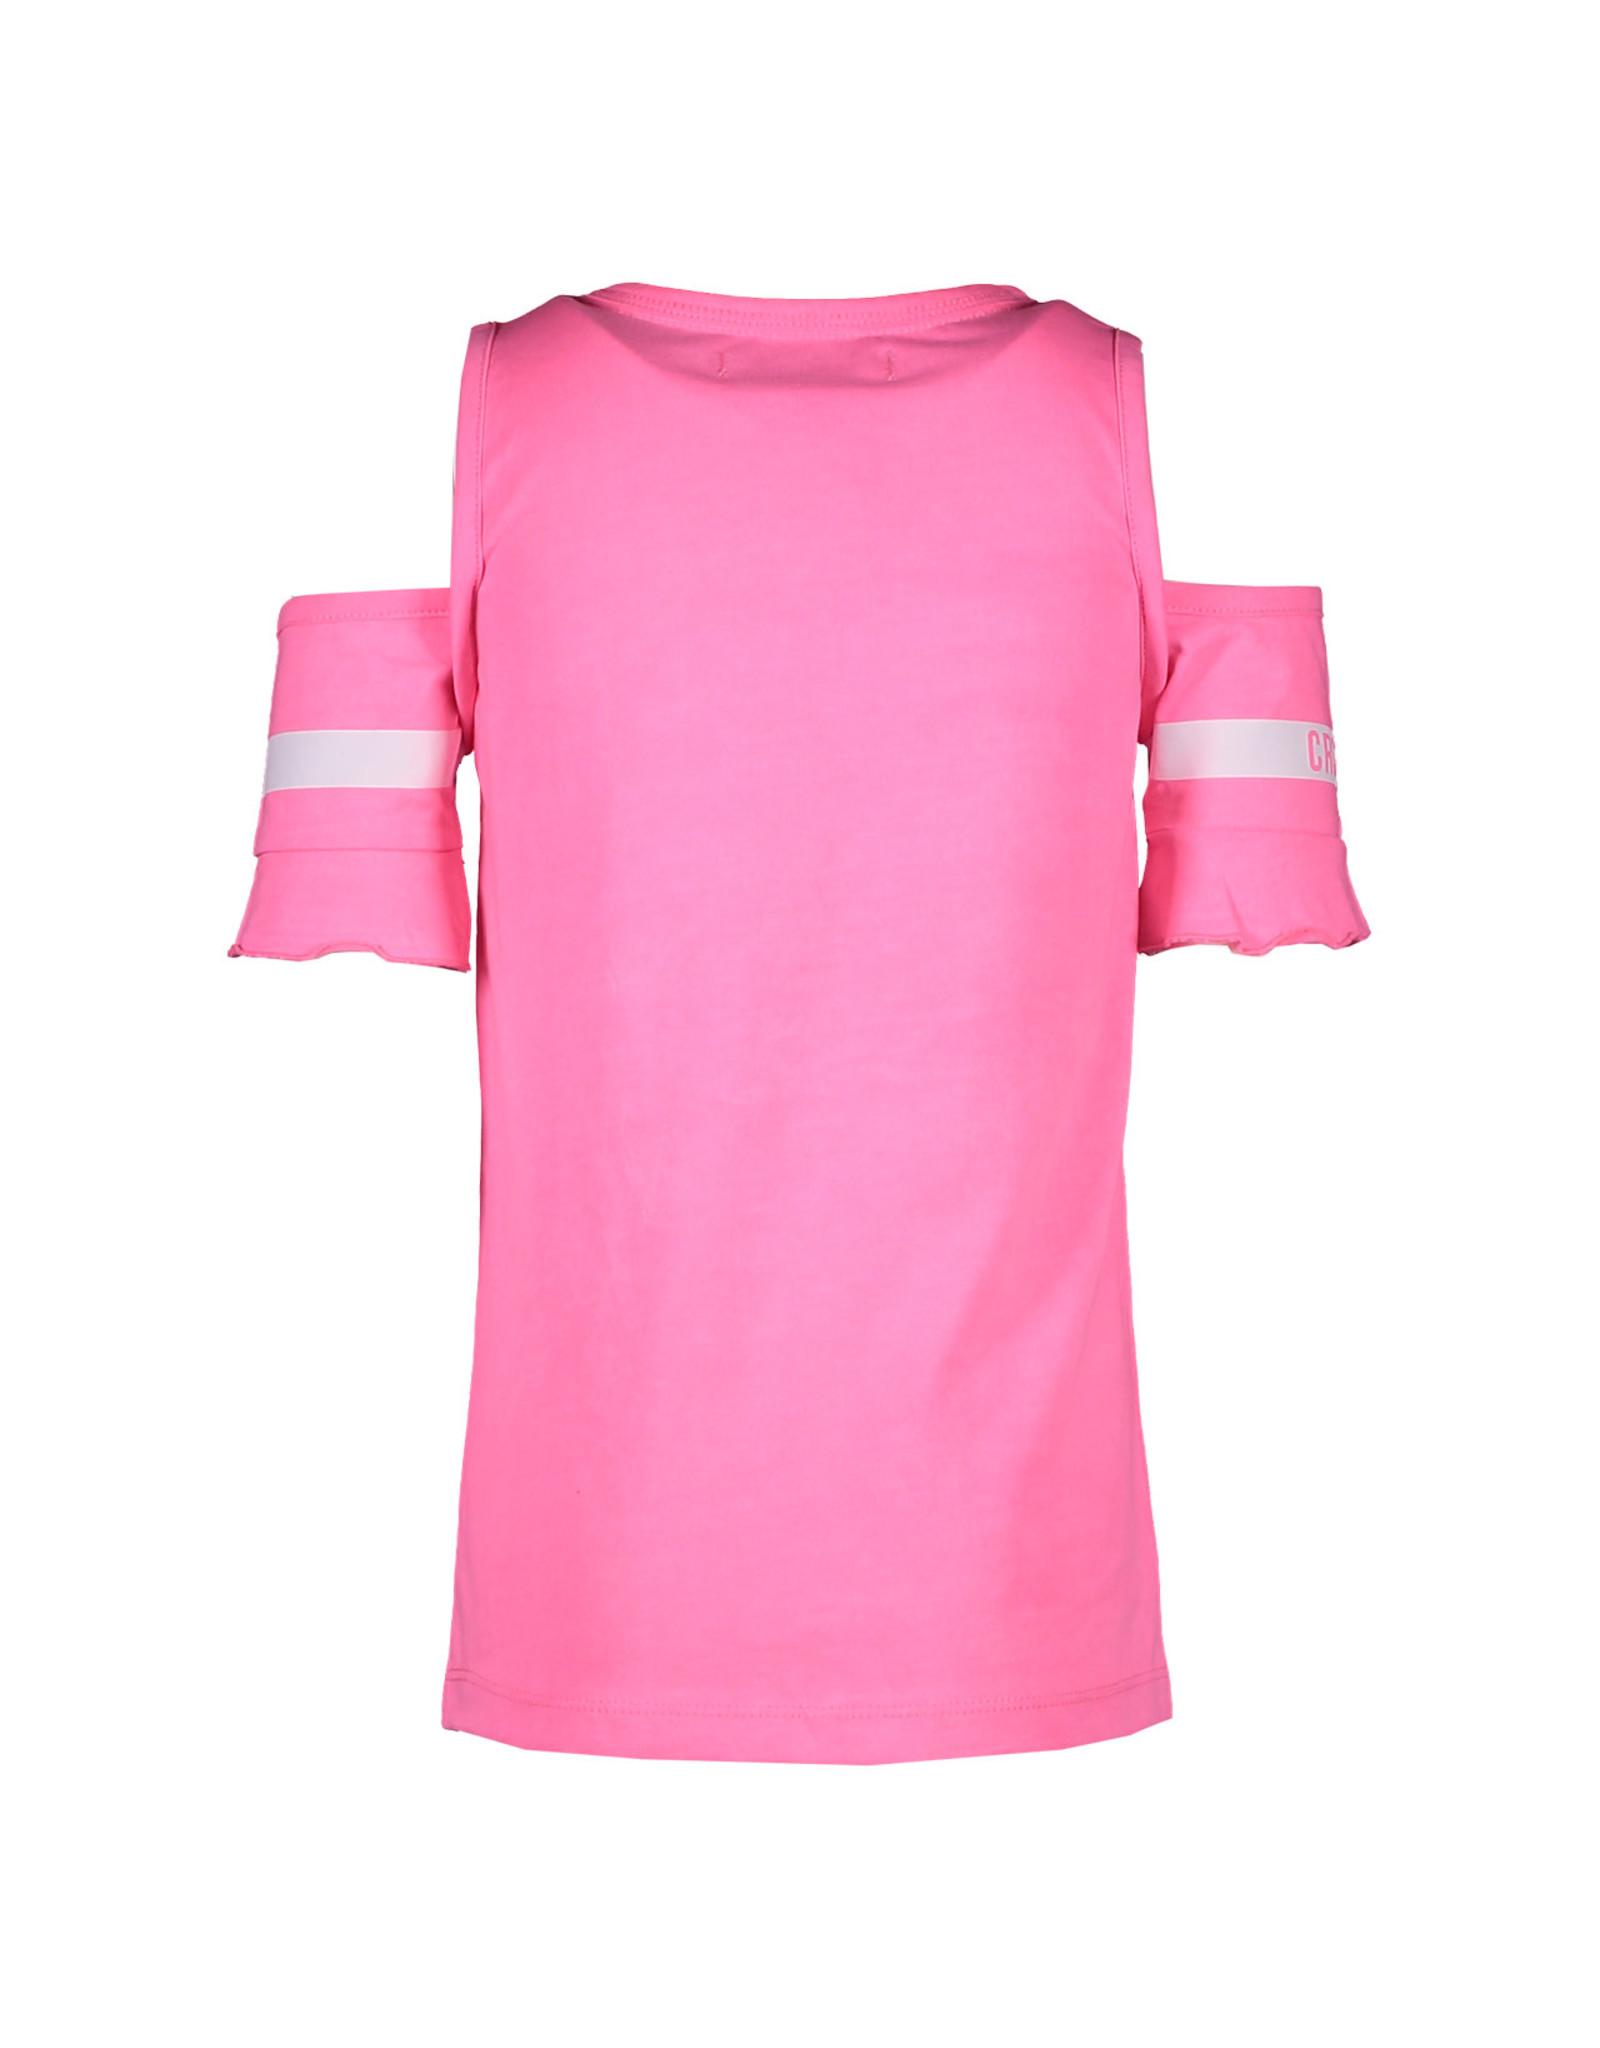 Cars Cars meisjes t-shirt Arenas Fuchsia